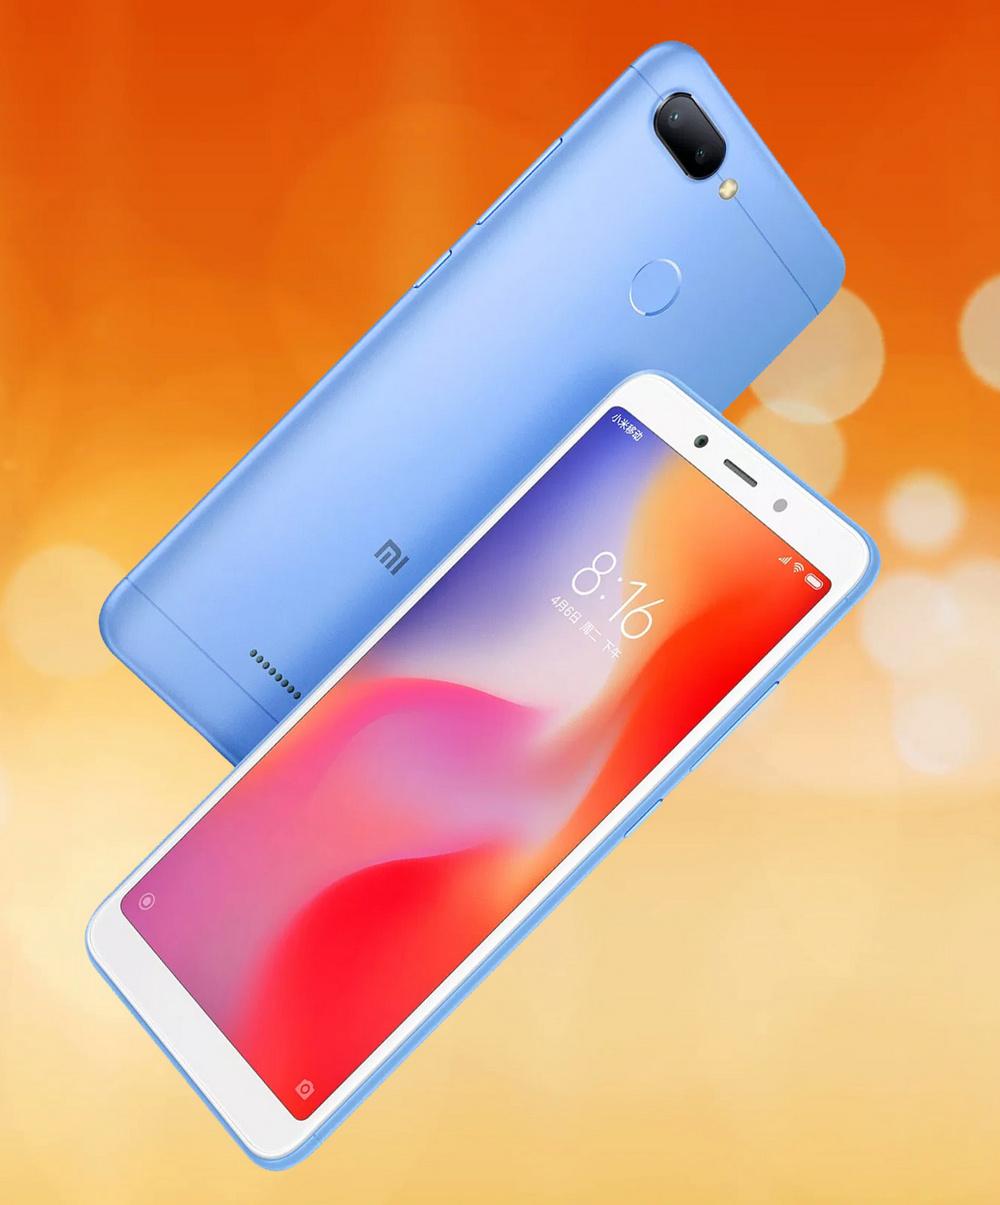 Xiaomi 6, Xiaomi 6A